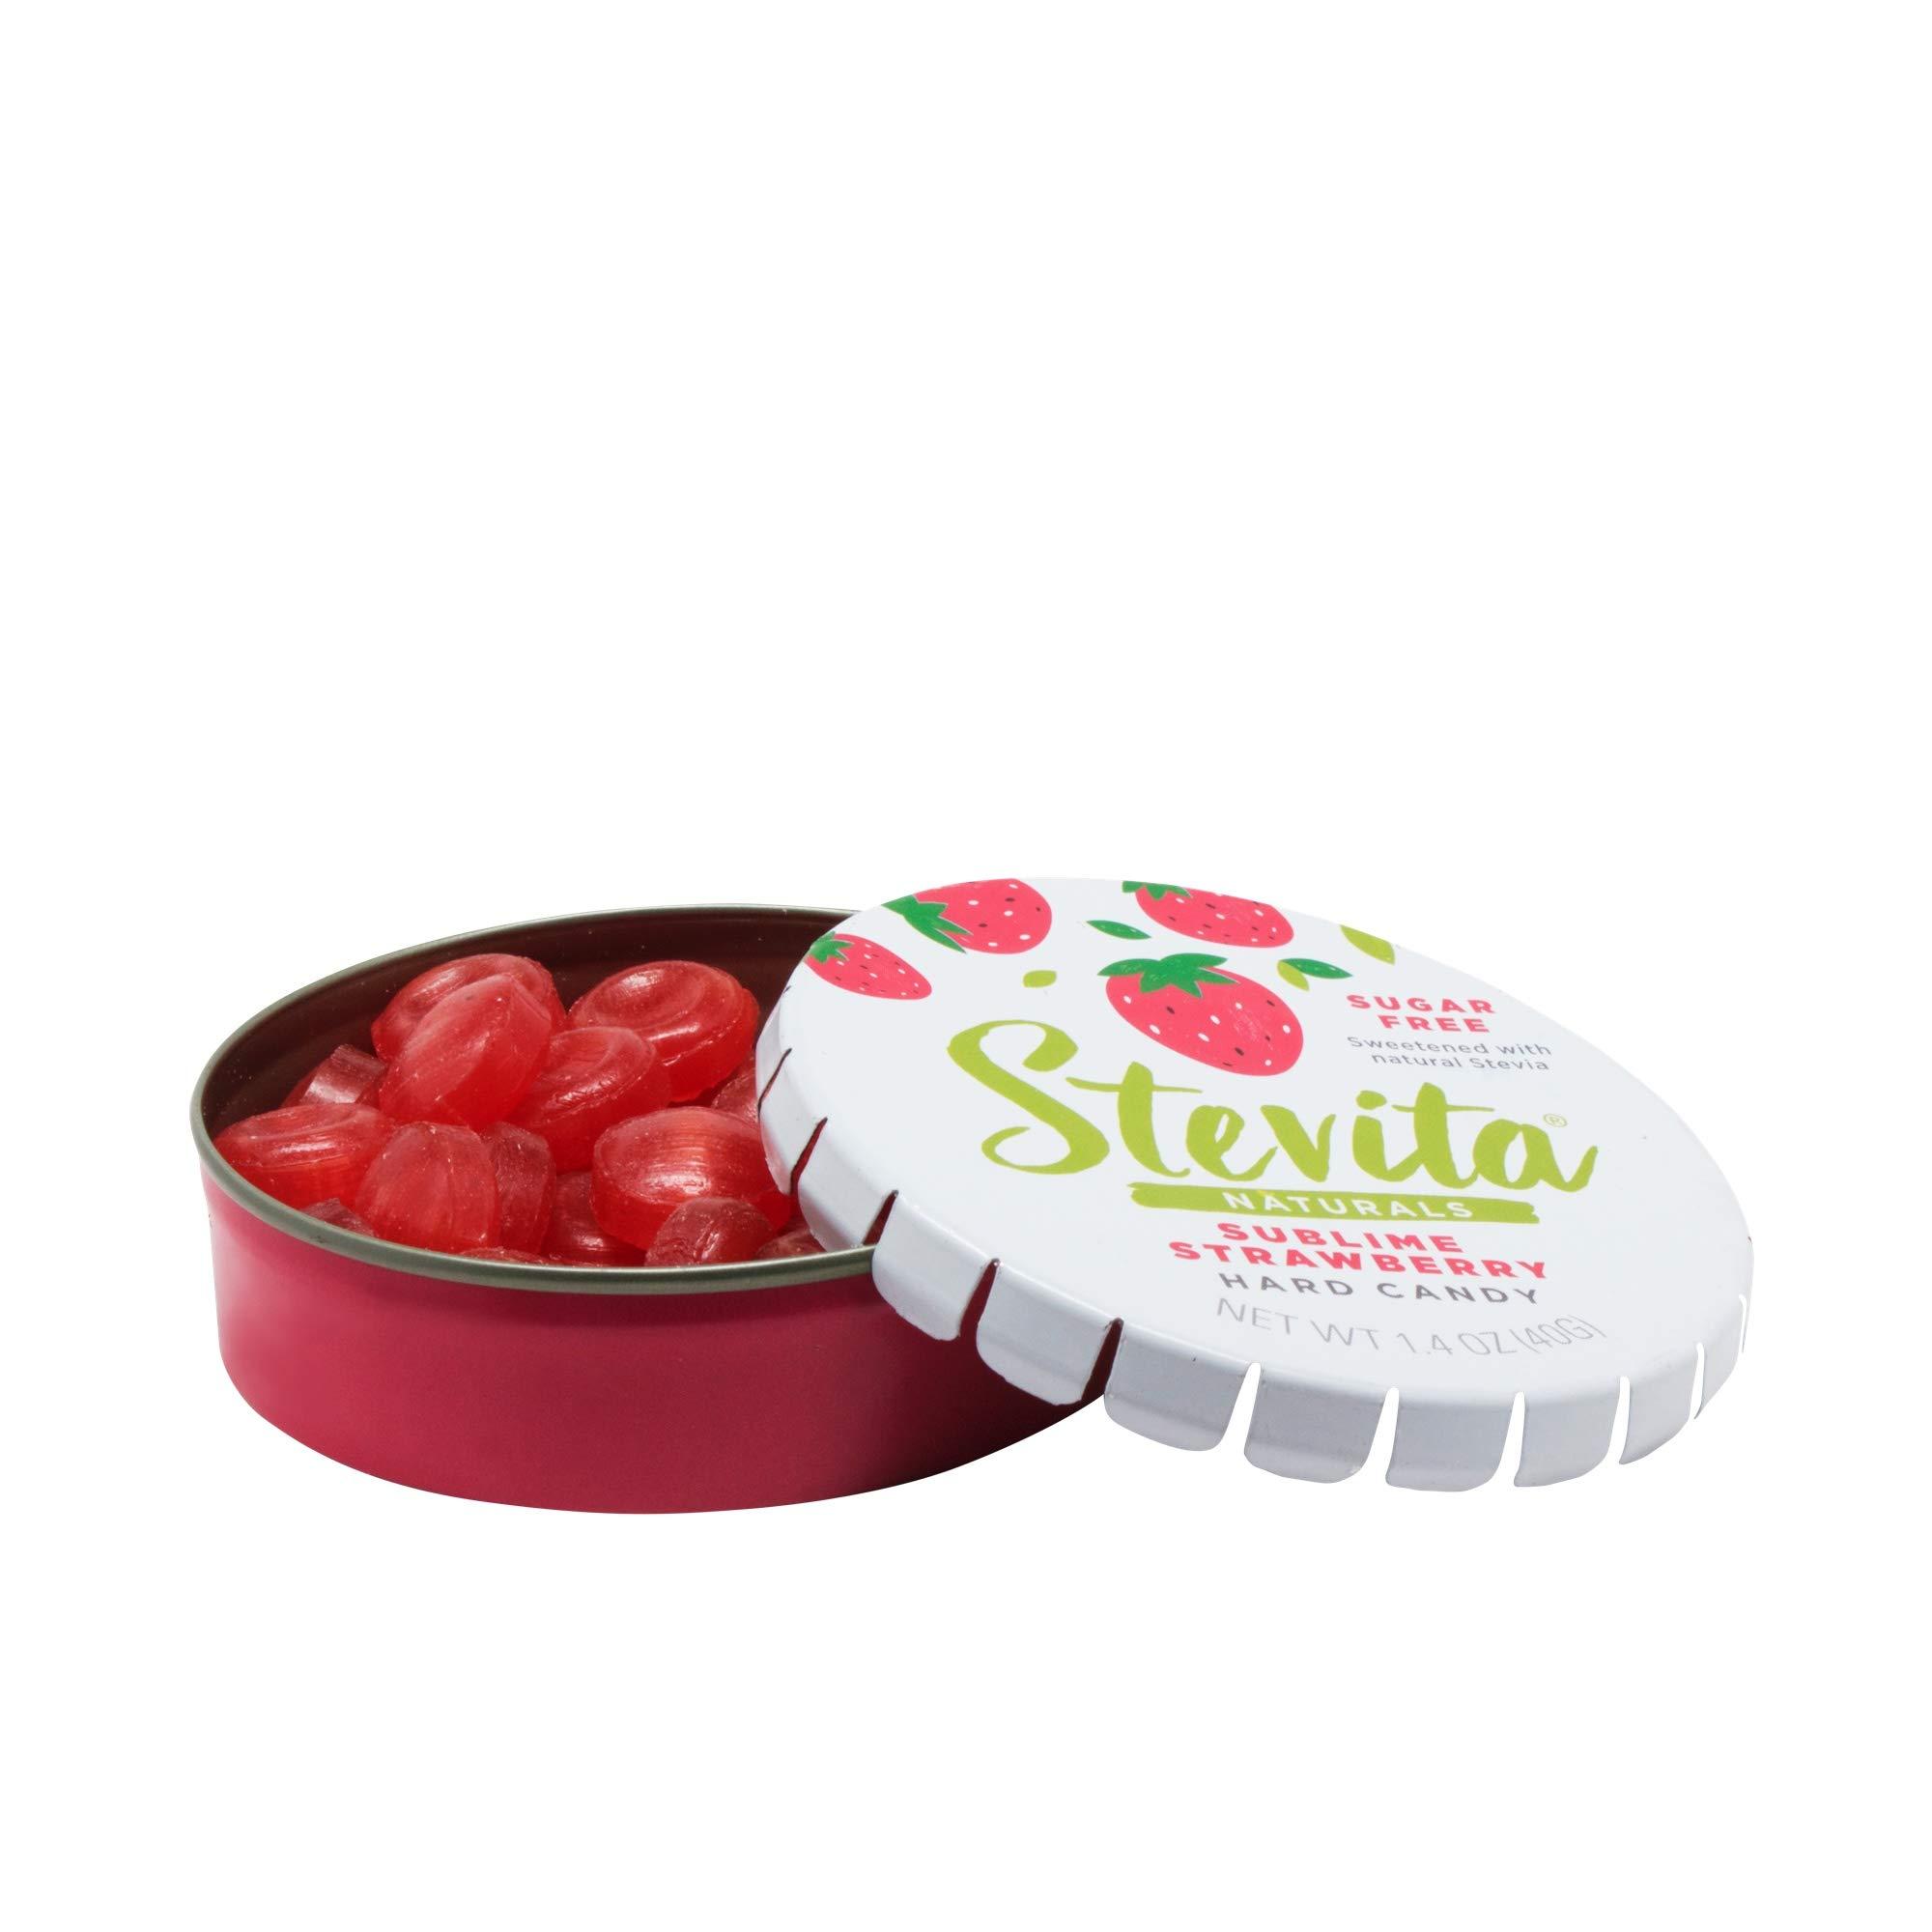 Stevita Stevia Sweet Candy Natural Strawberry Flavor- 1.4 Oz - Sugar Free Hard Candy, Stevia Sweetened - Usda Organic, Non Gmo, Keto, Paleo, Gluten-Free - 26 Servings, Pack of 1